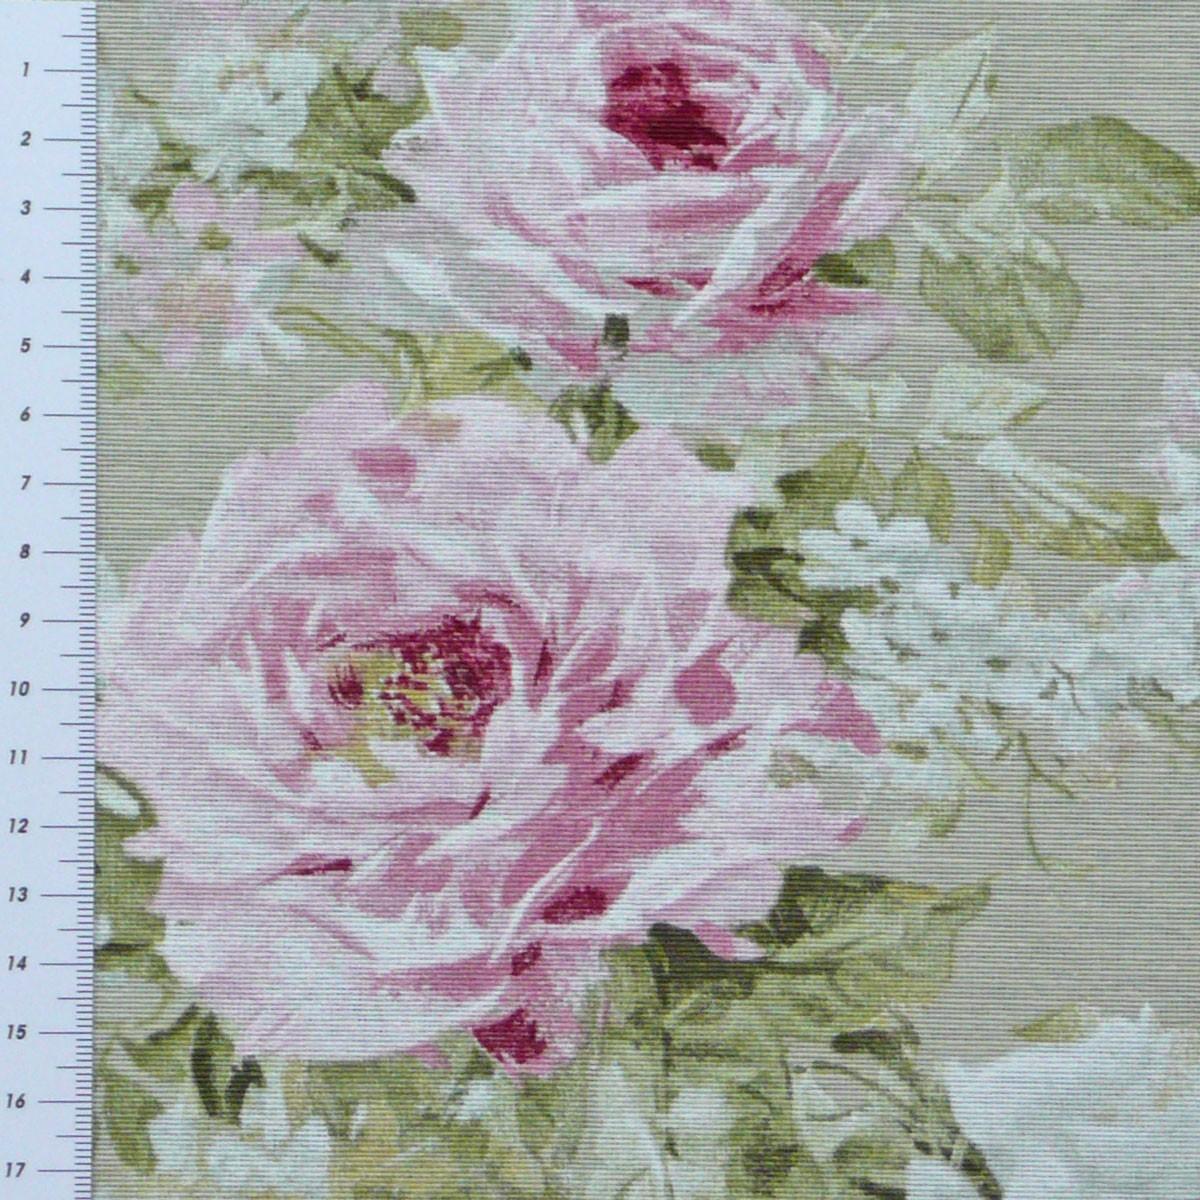 dekostoff rosen beige gardinenstoff stoff meterware stoffe stoffe gemustert stoff blumen. Black Bedroom Furniture Sets. Home Design Ideas